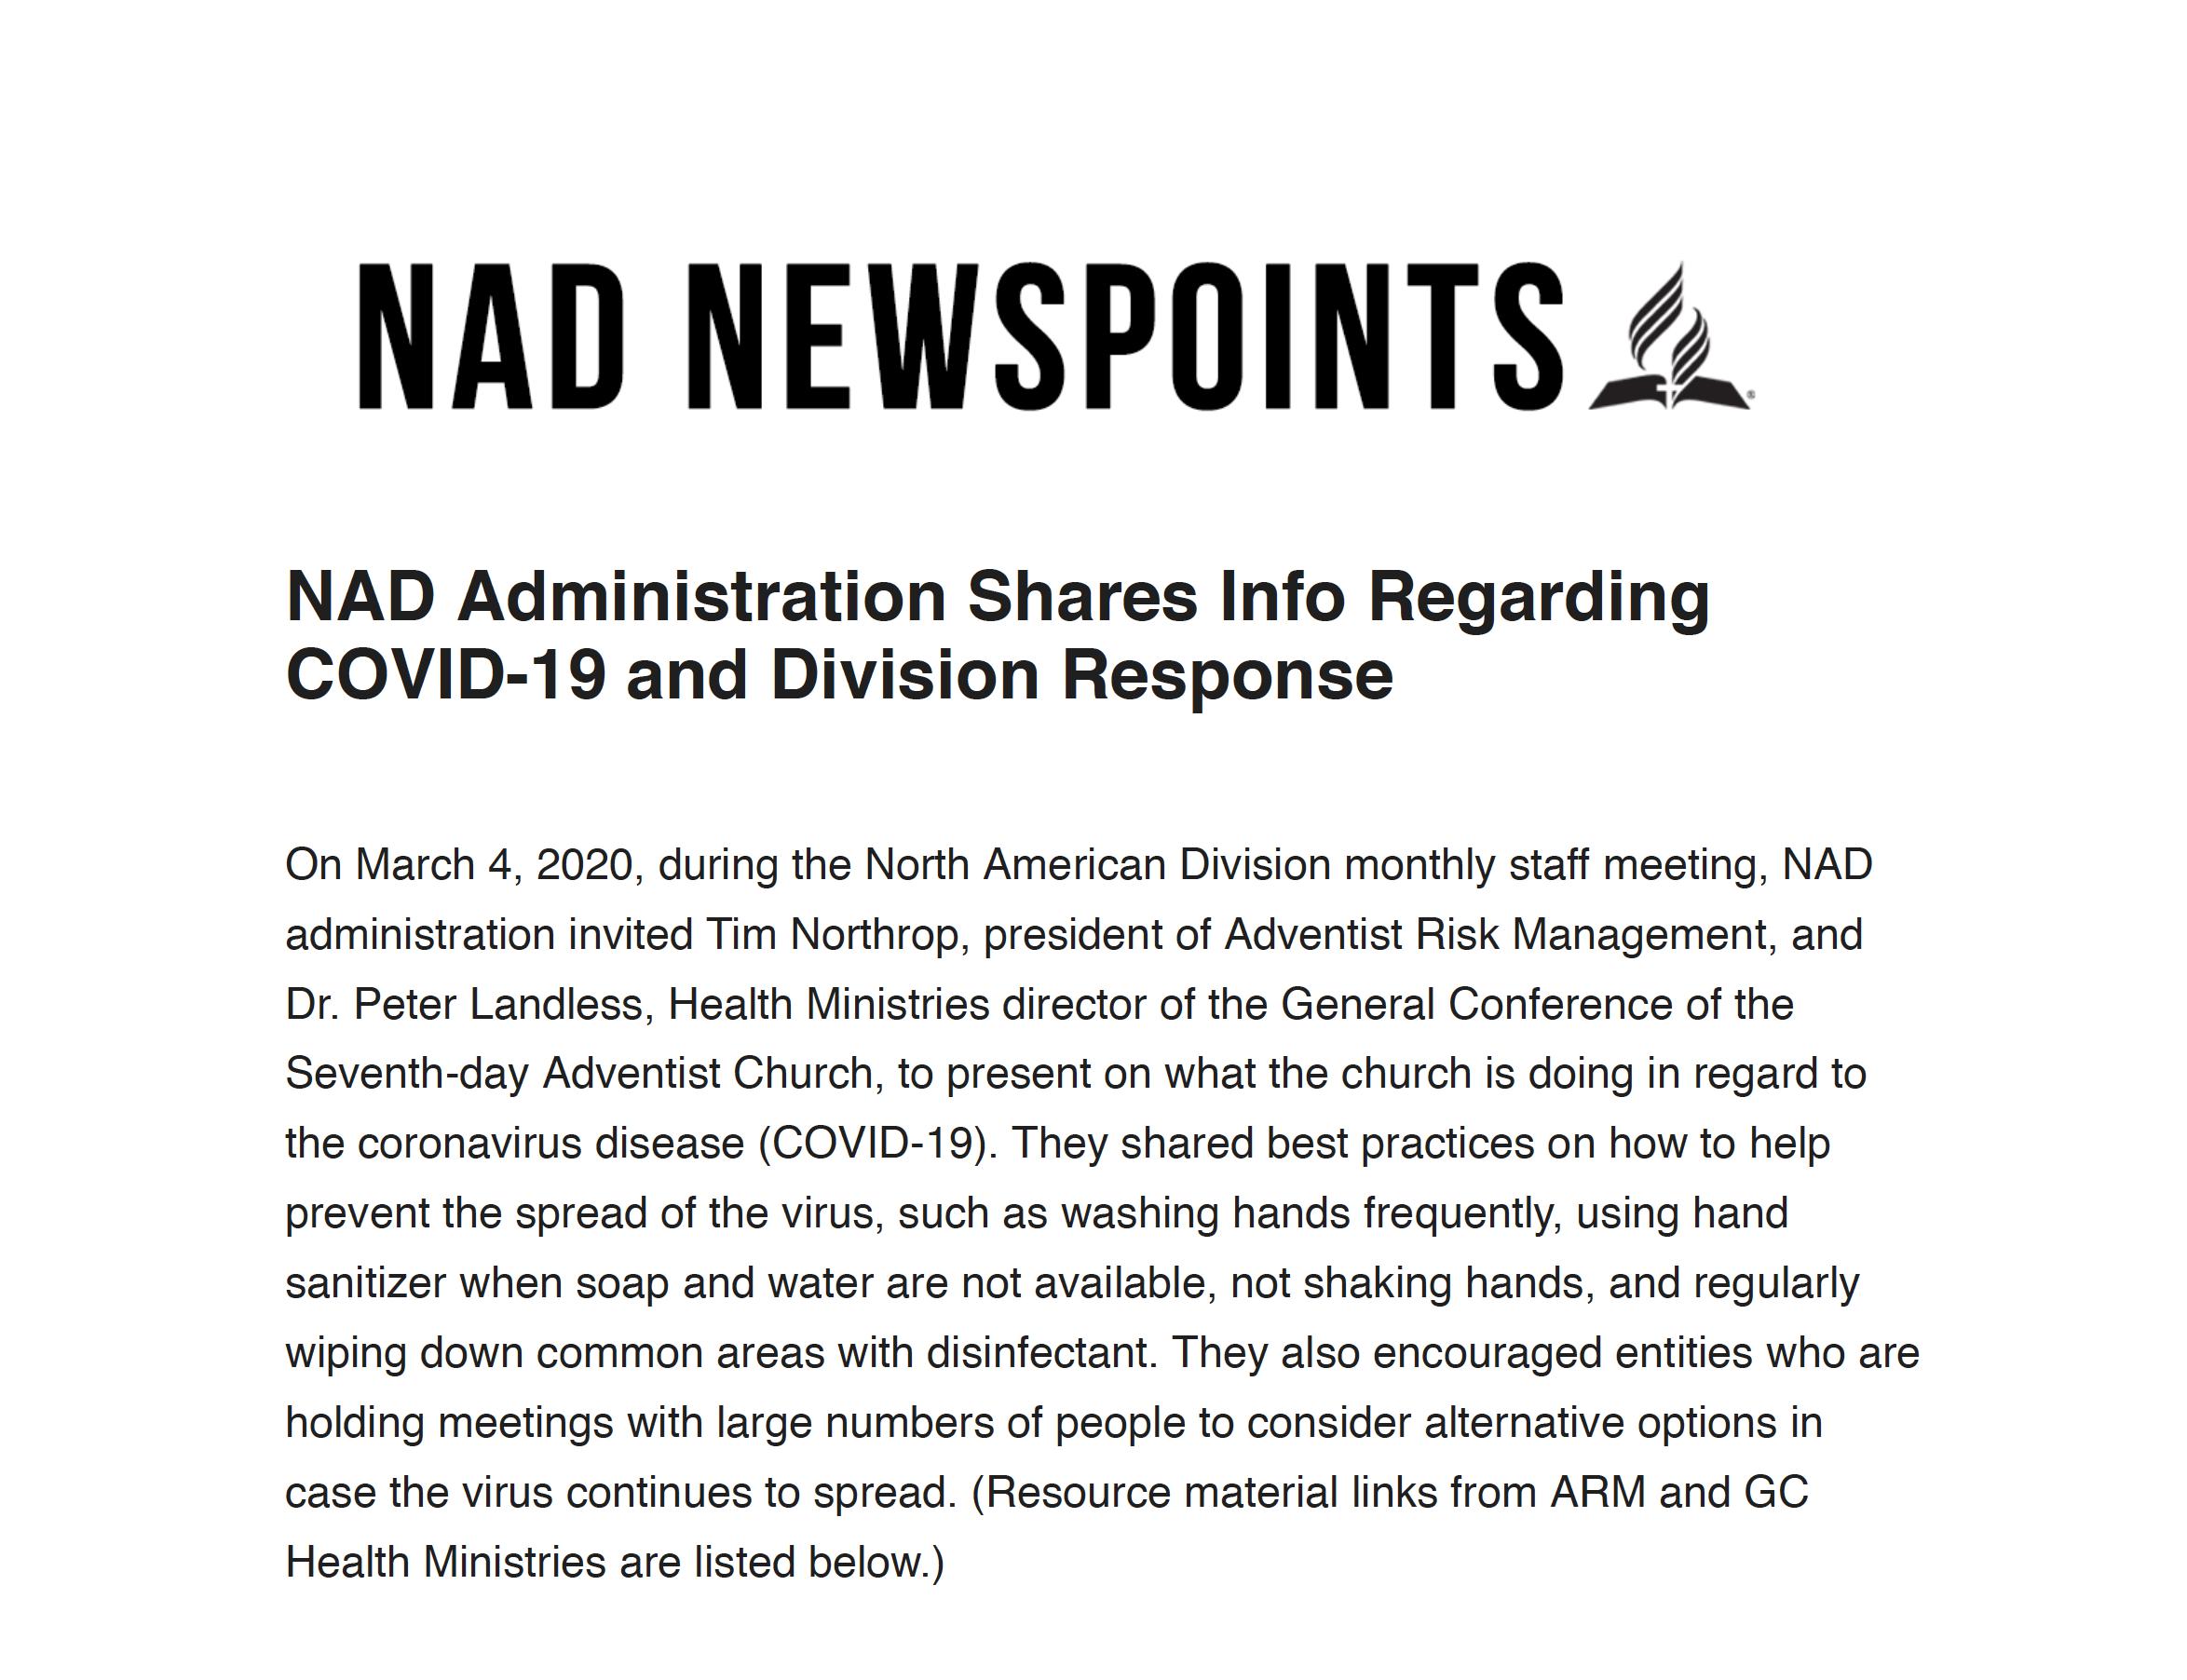 NAD Covid-19 Statement